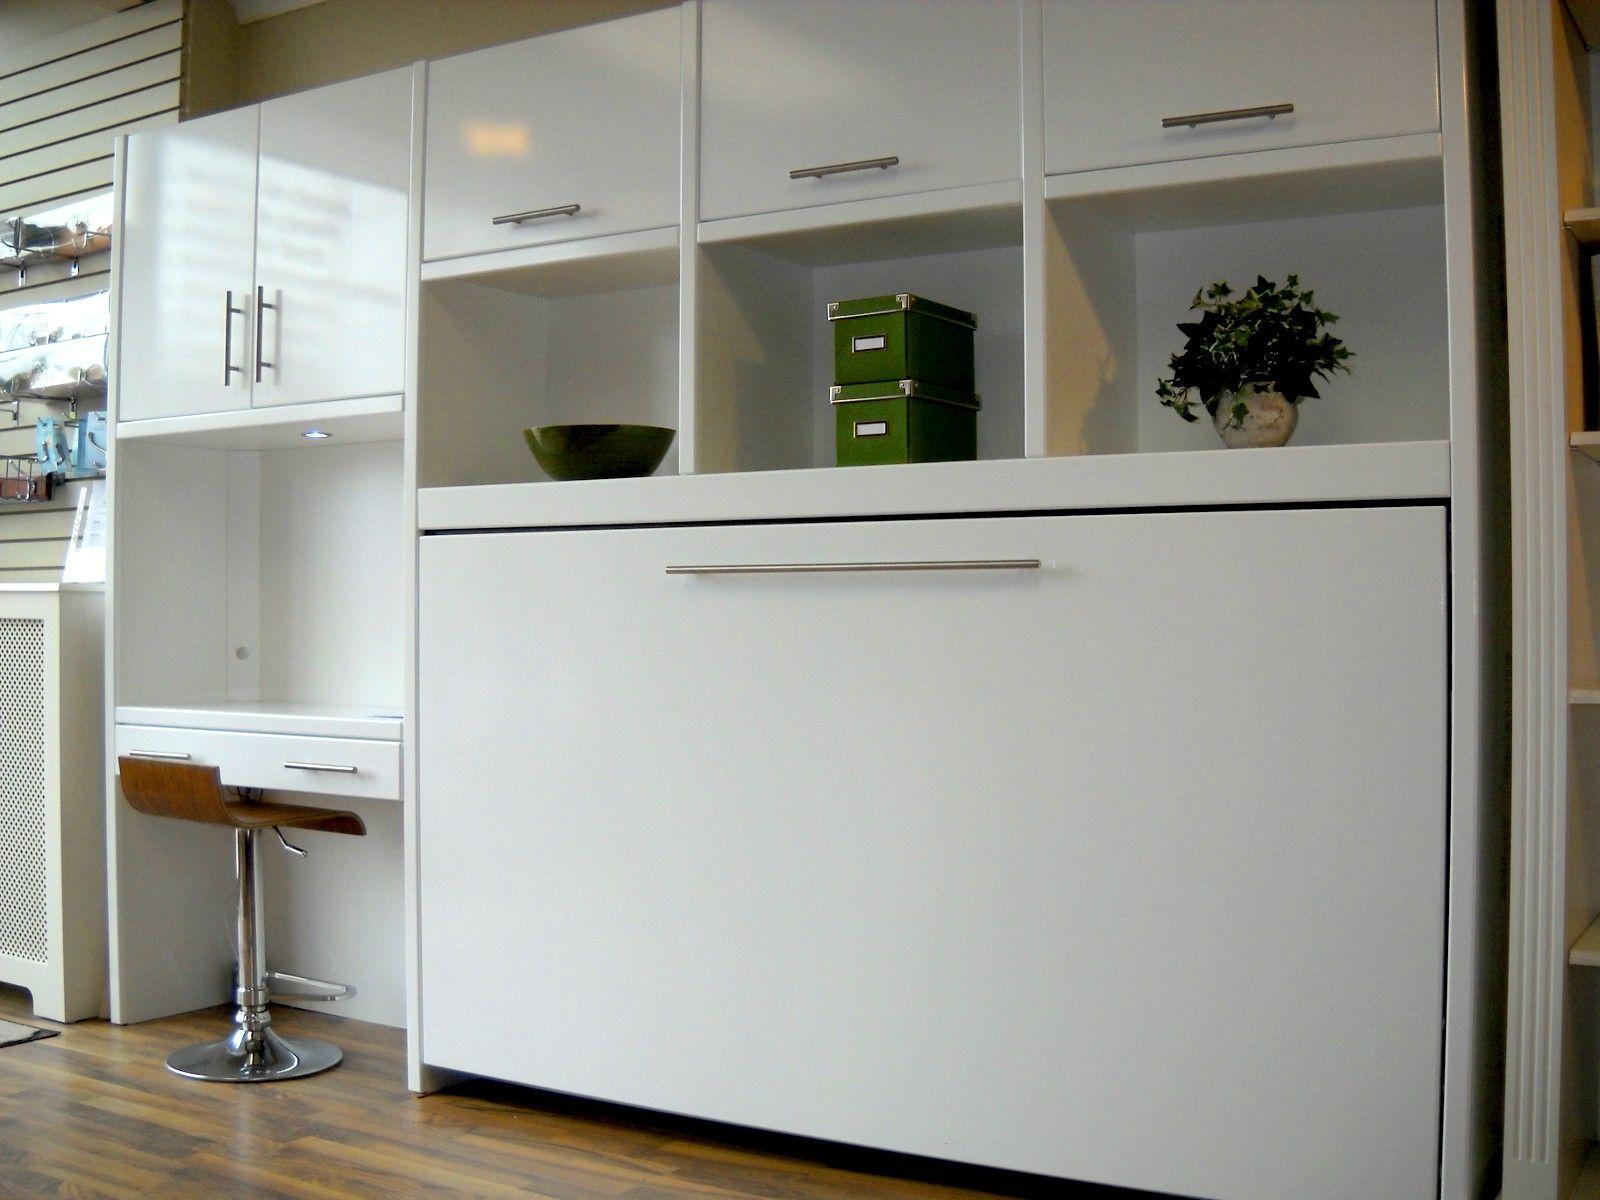 l sung f r kleine r ume 21 wandbett ideen kinderzimmer. Black Bedroom Furniture Sets. Home Design Ideas